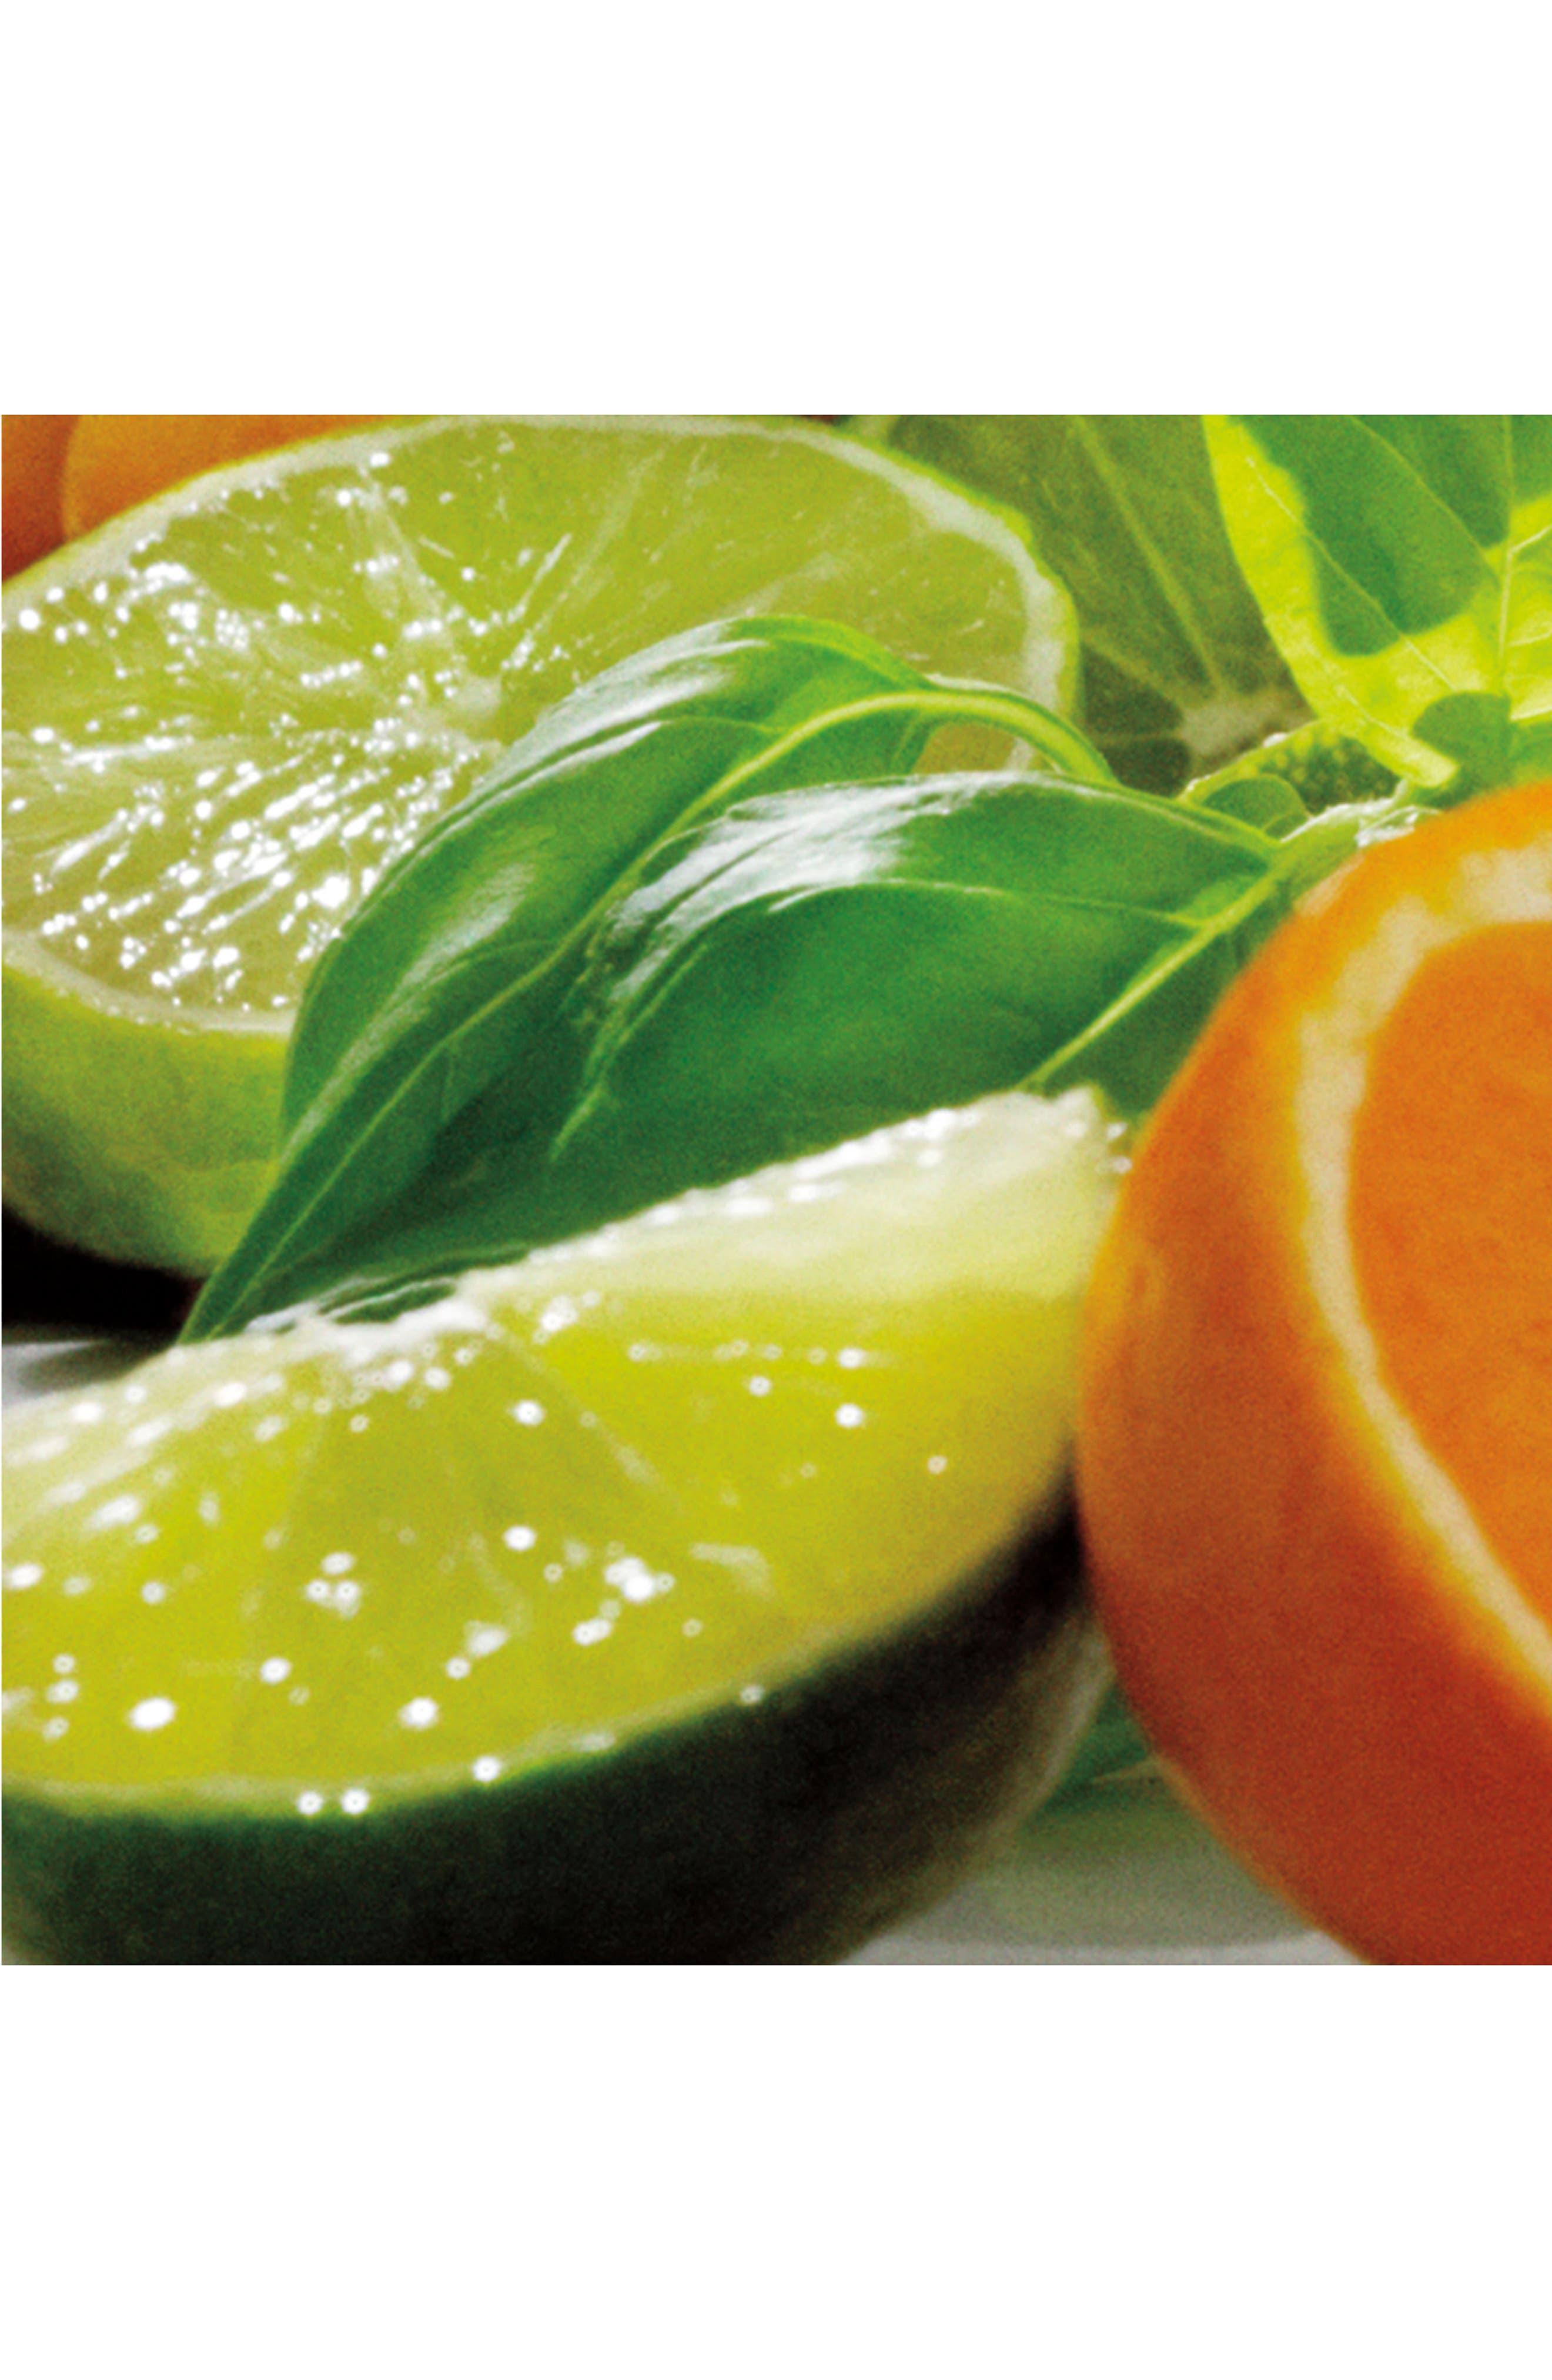 Alternate Image 3  - Jo Malone London™ 'Lime Basil & Mandarin' Bath Oil (8.5 oz.)